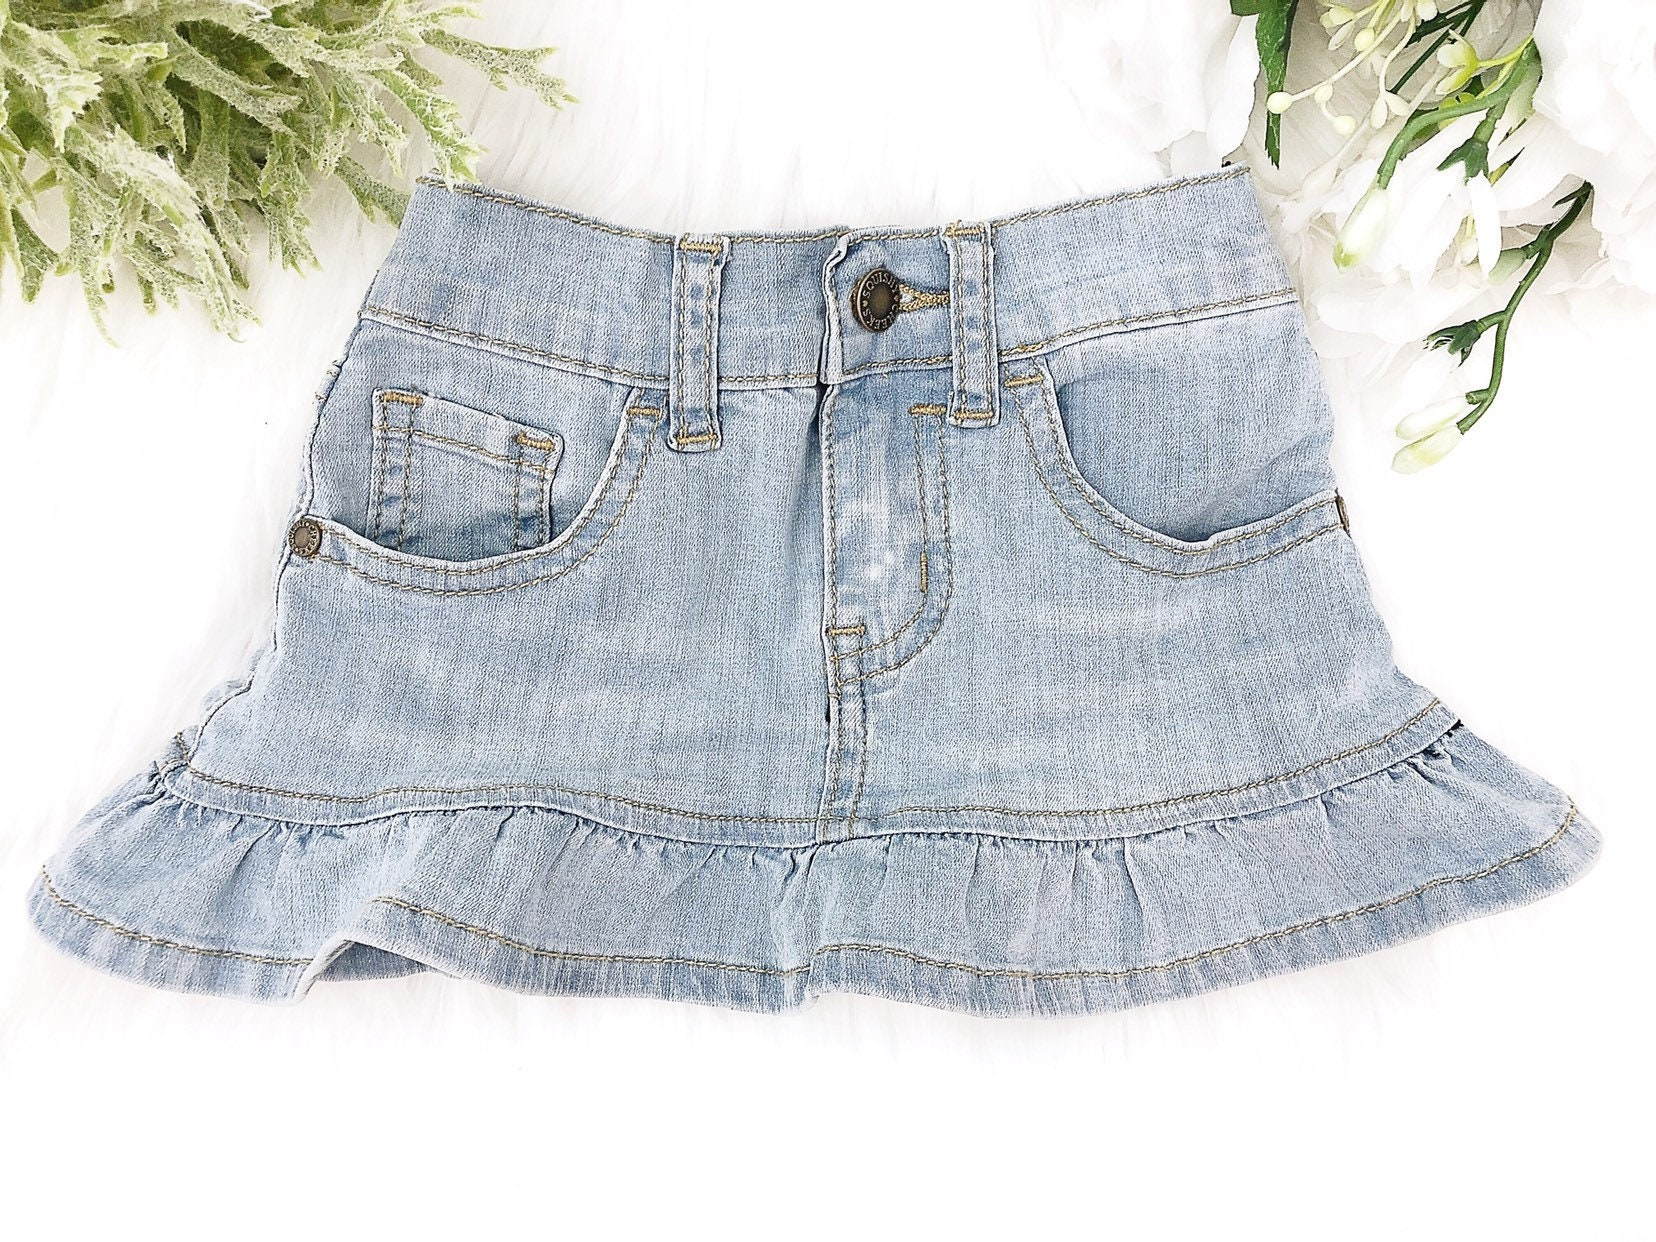 bec382d941 Stretchy Light Blue Denim Skirt – DACC